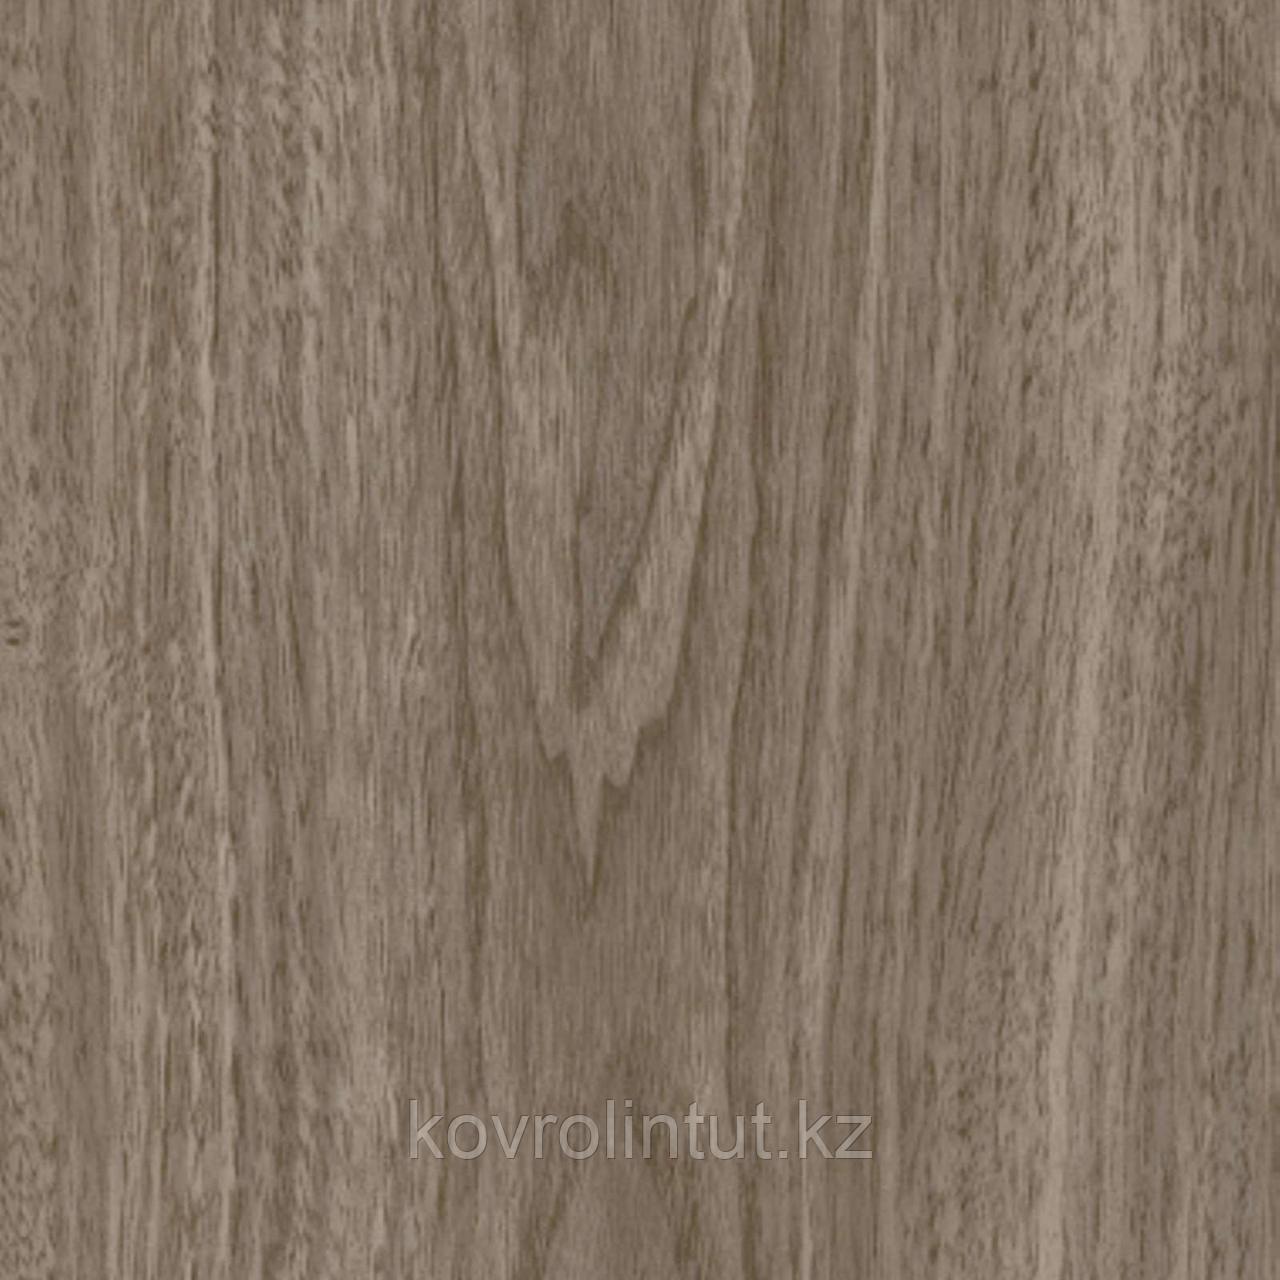 Плитка ПВХ клеевая IVC Ultimo Eden Walnut 28843Q